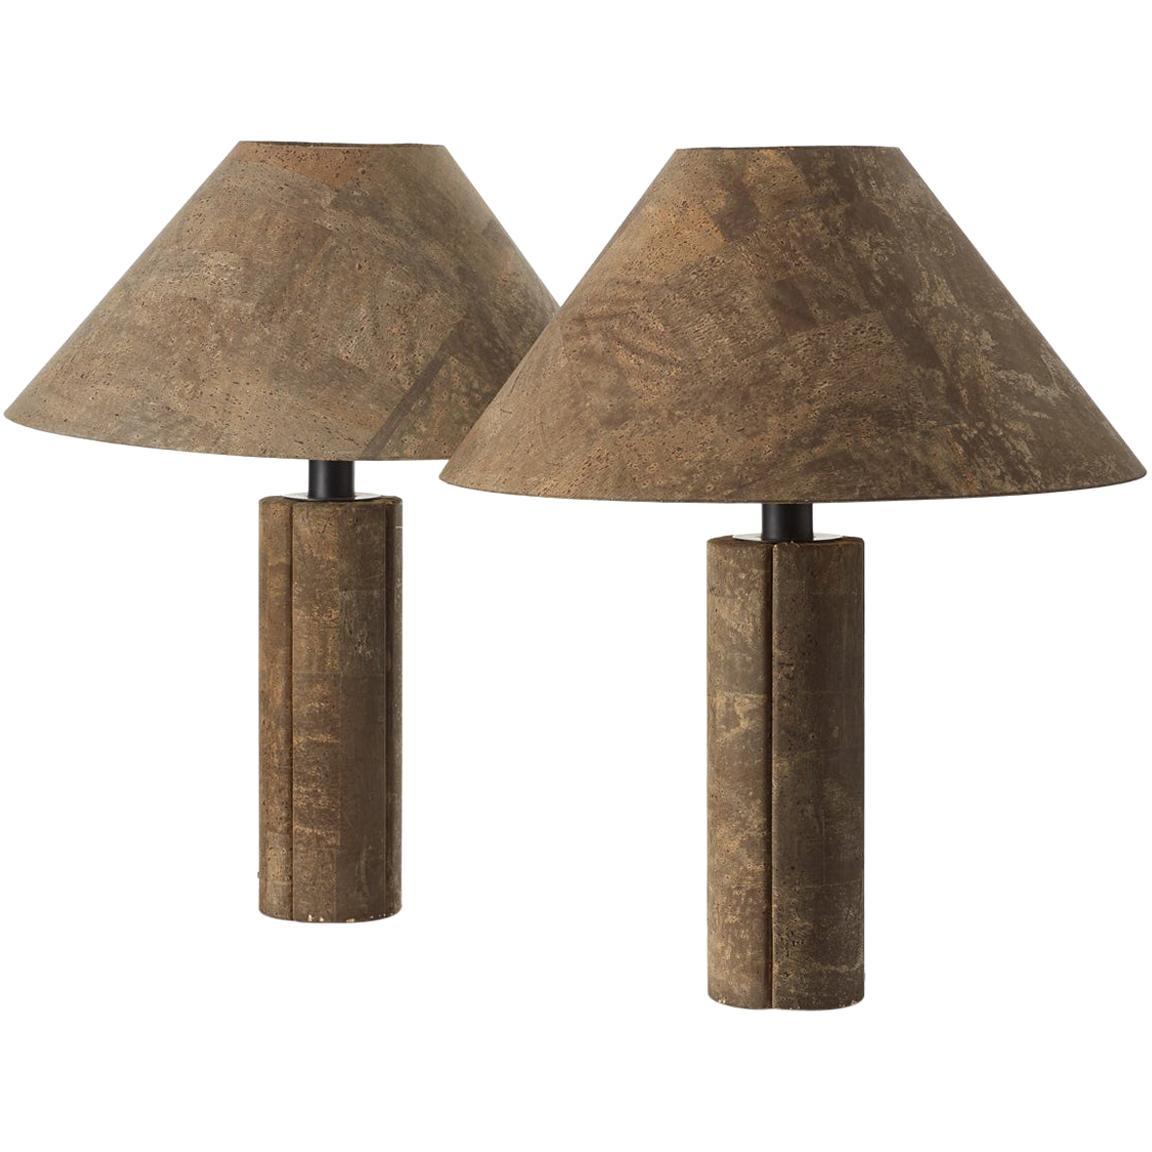 Pair of Ingo Maurer Cork Lamps for Design M, Germany, 1974